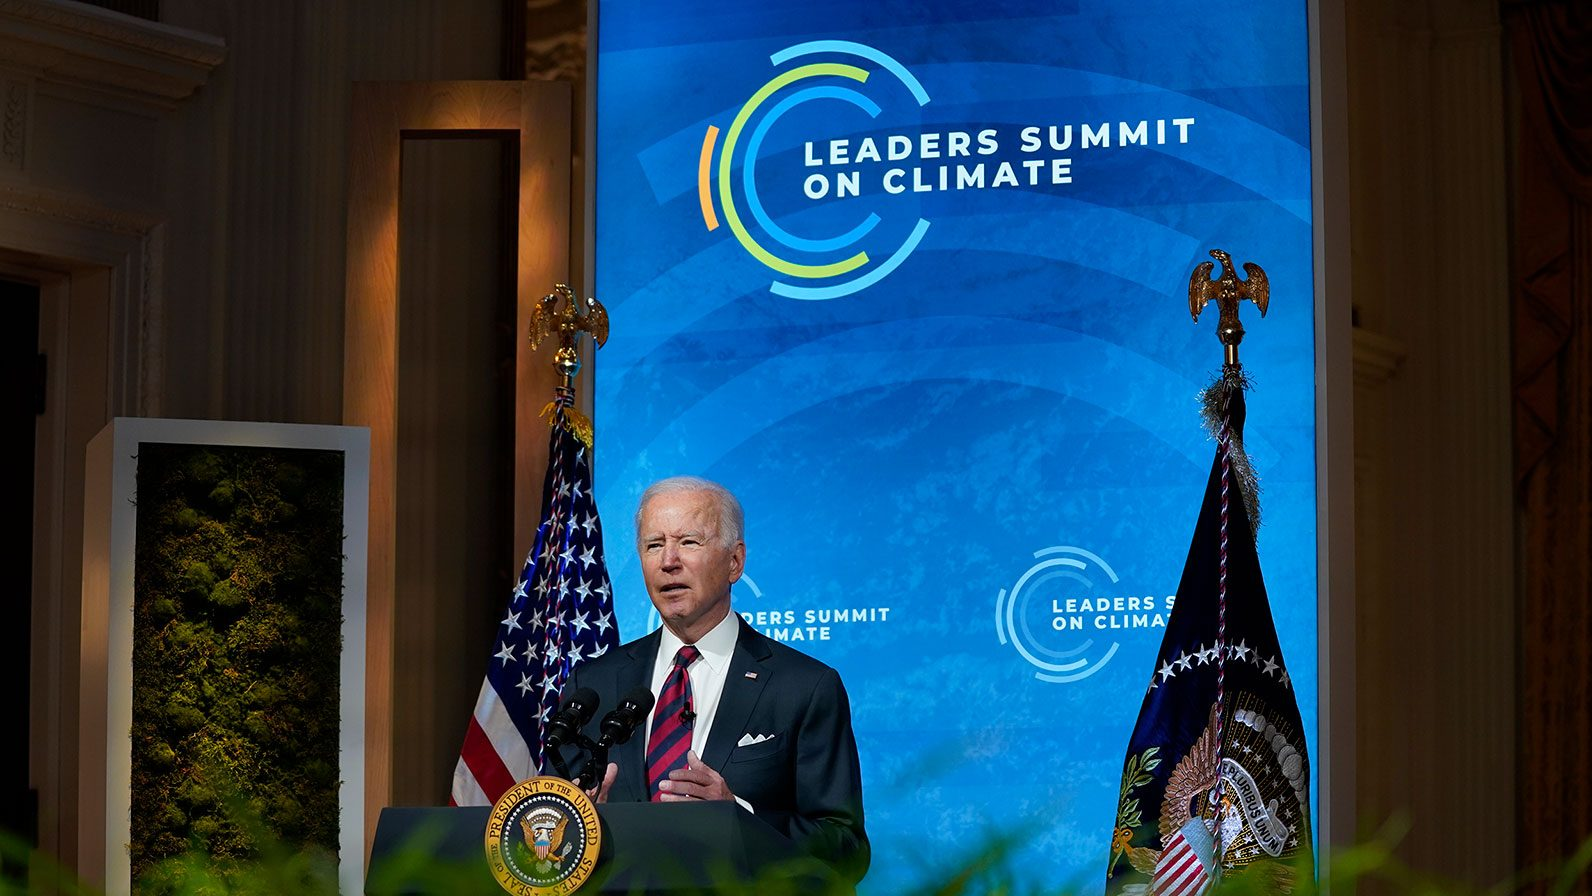 Biden cumbre climática emisiones